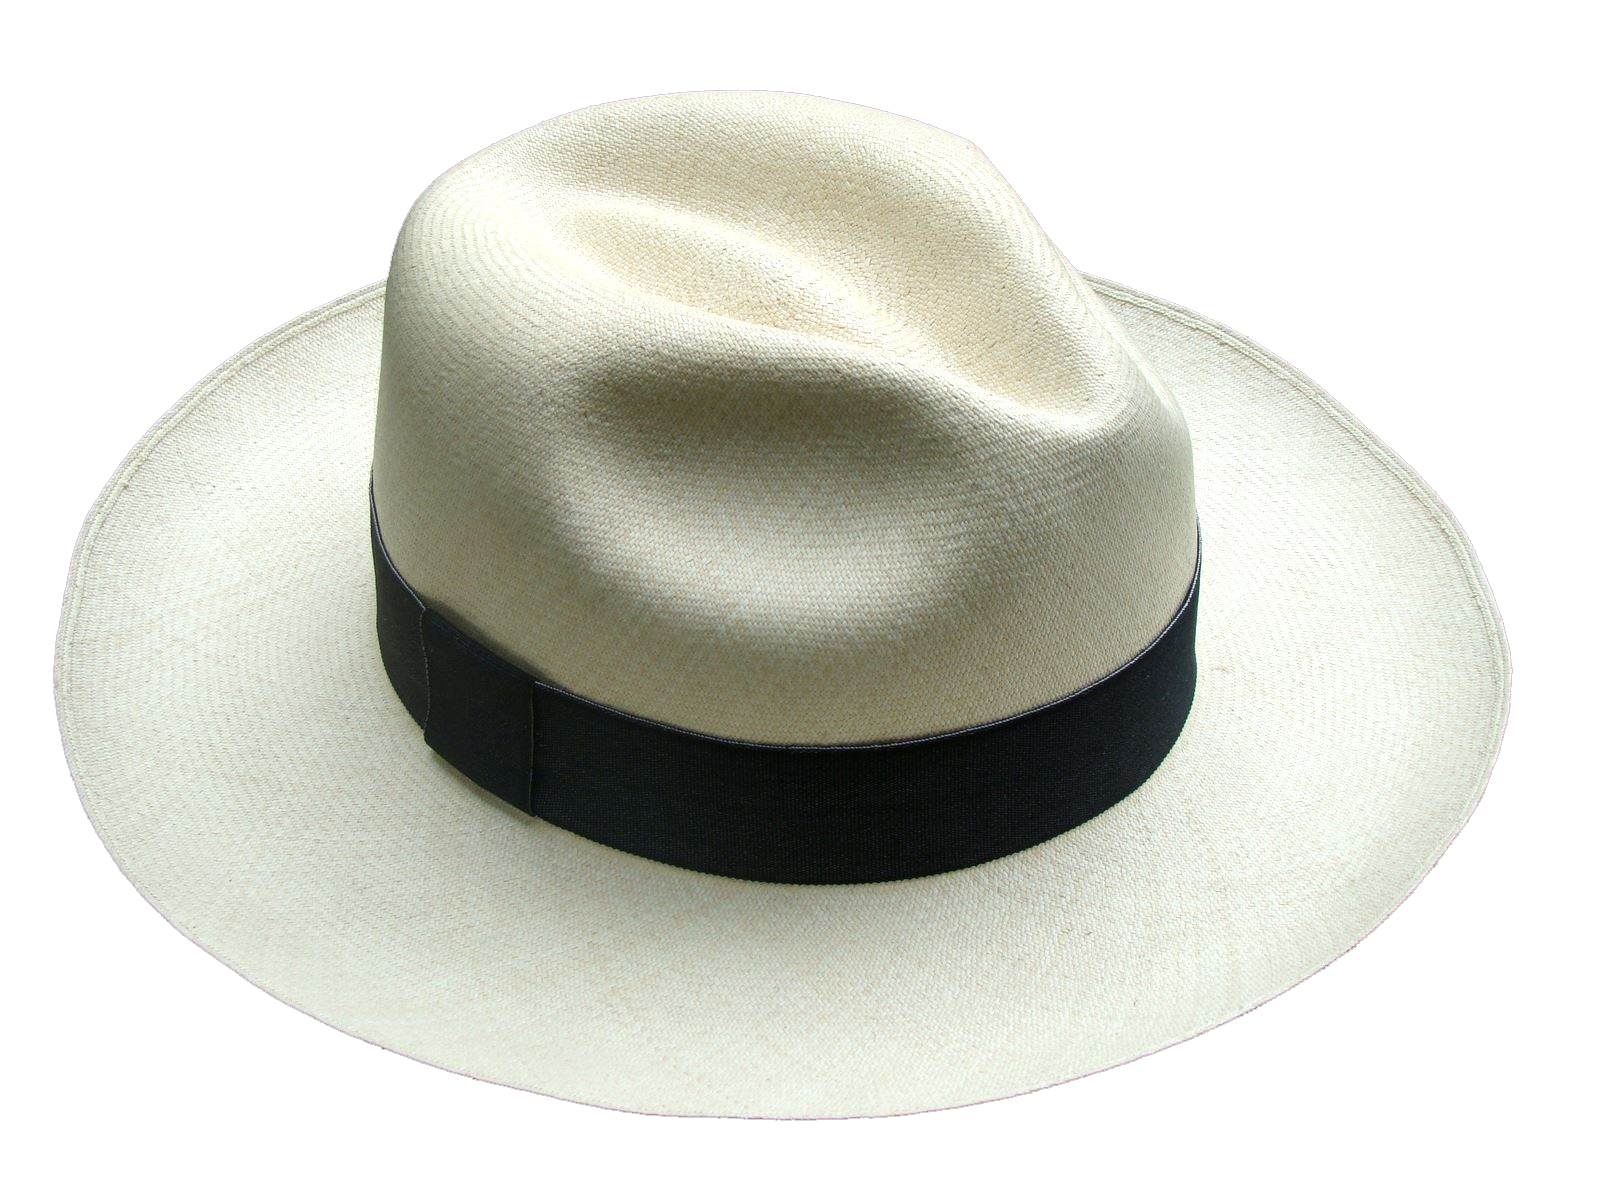 c81a7c1ec4600 Panama hat Clásico fino fino